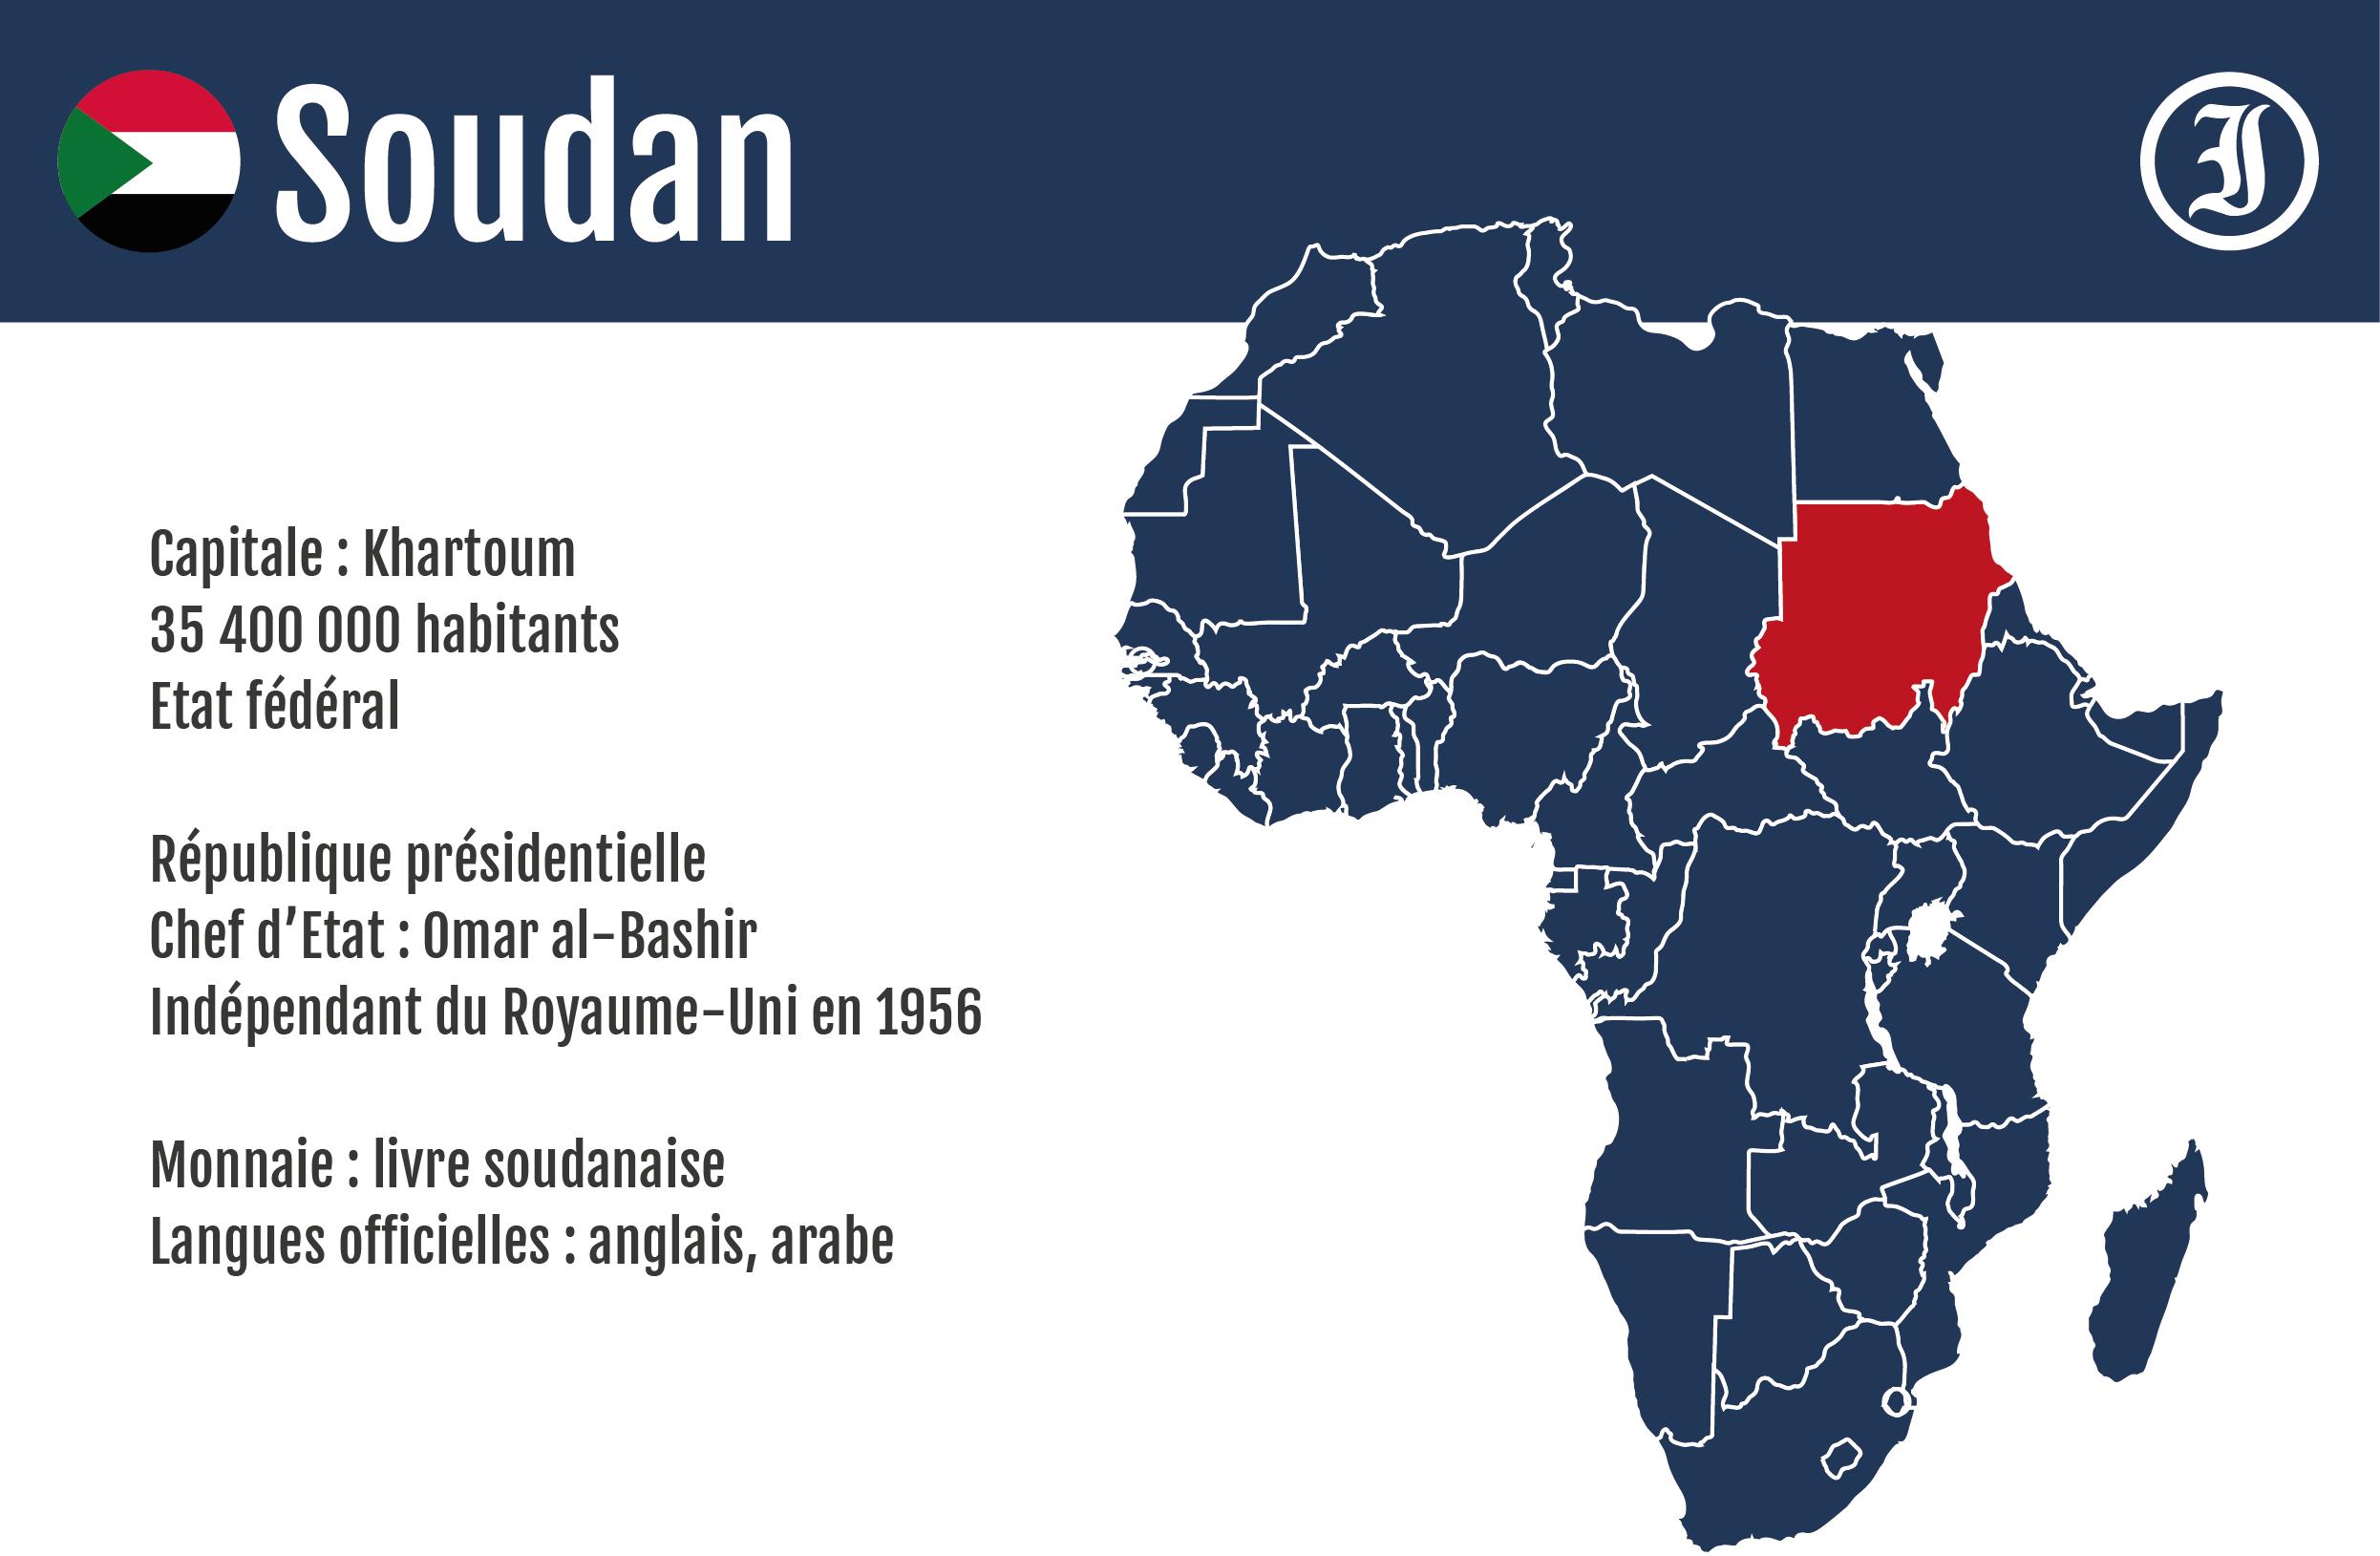 Soudan : des rebelles s'emparent d'urnes électorales